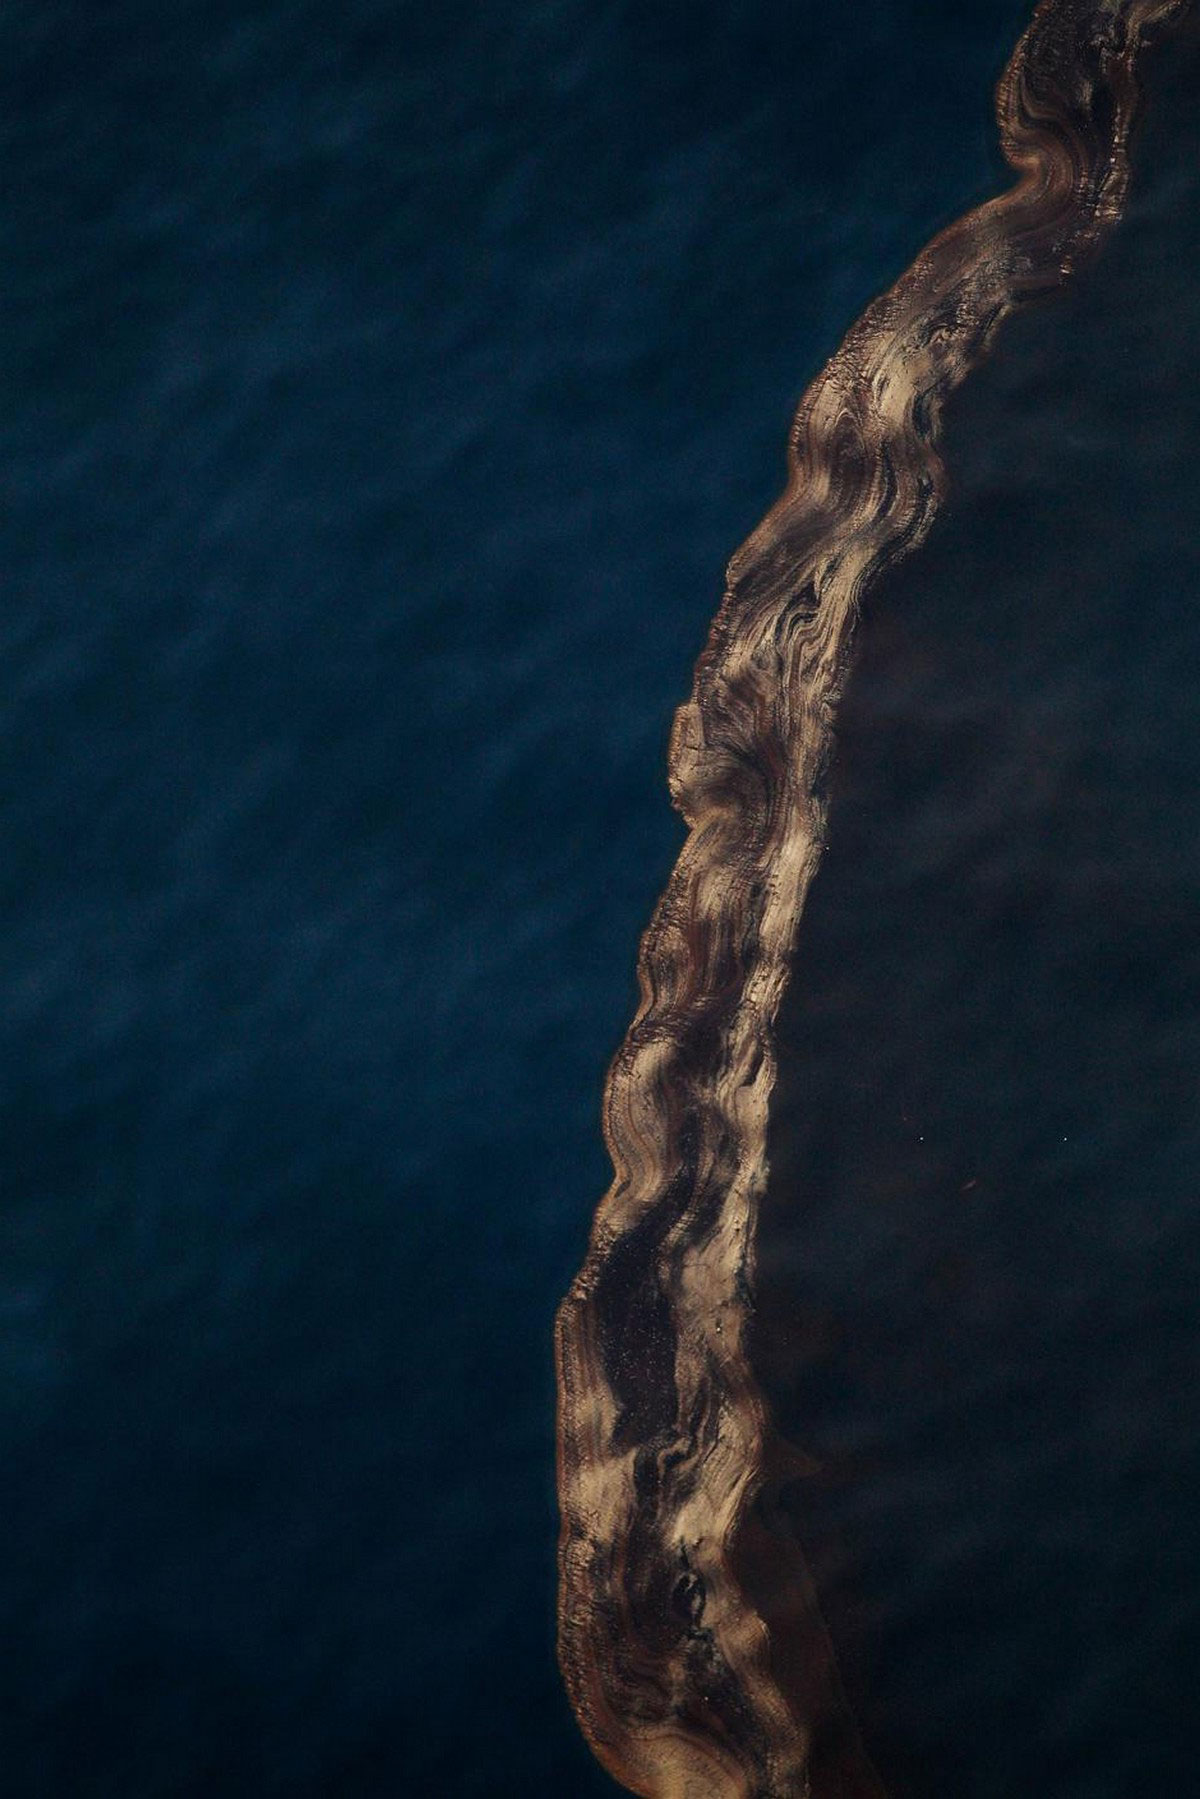 работы по остановке утечки нефти на глубине